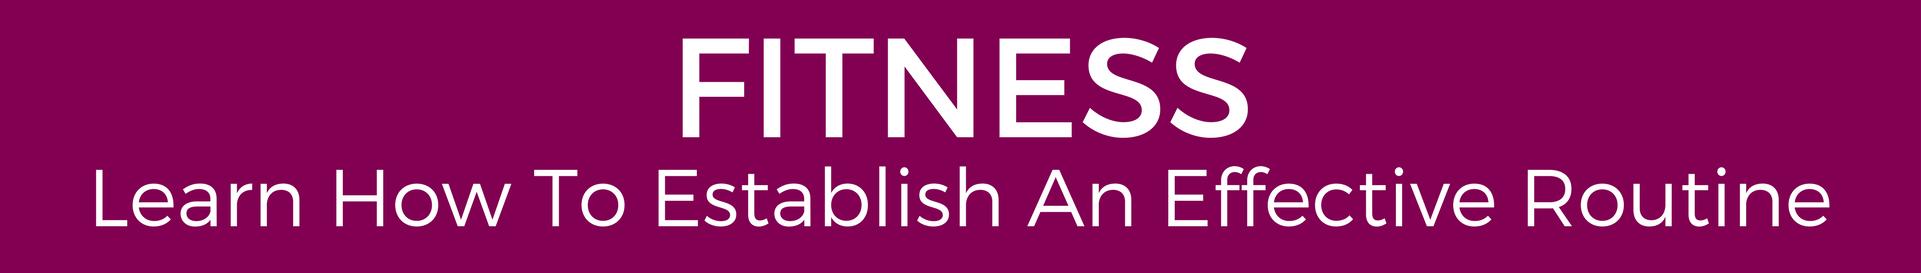 Fitness On Twitter